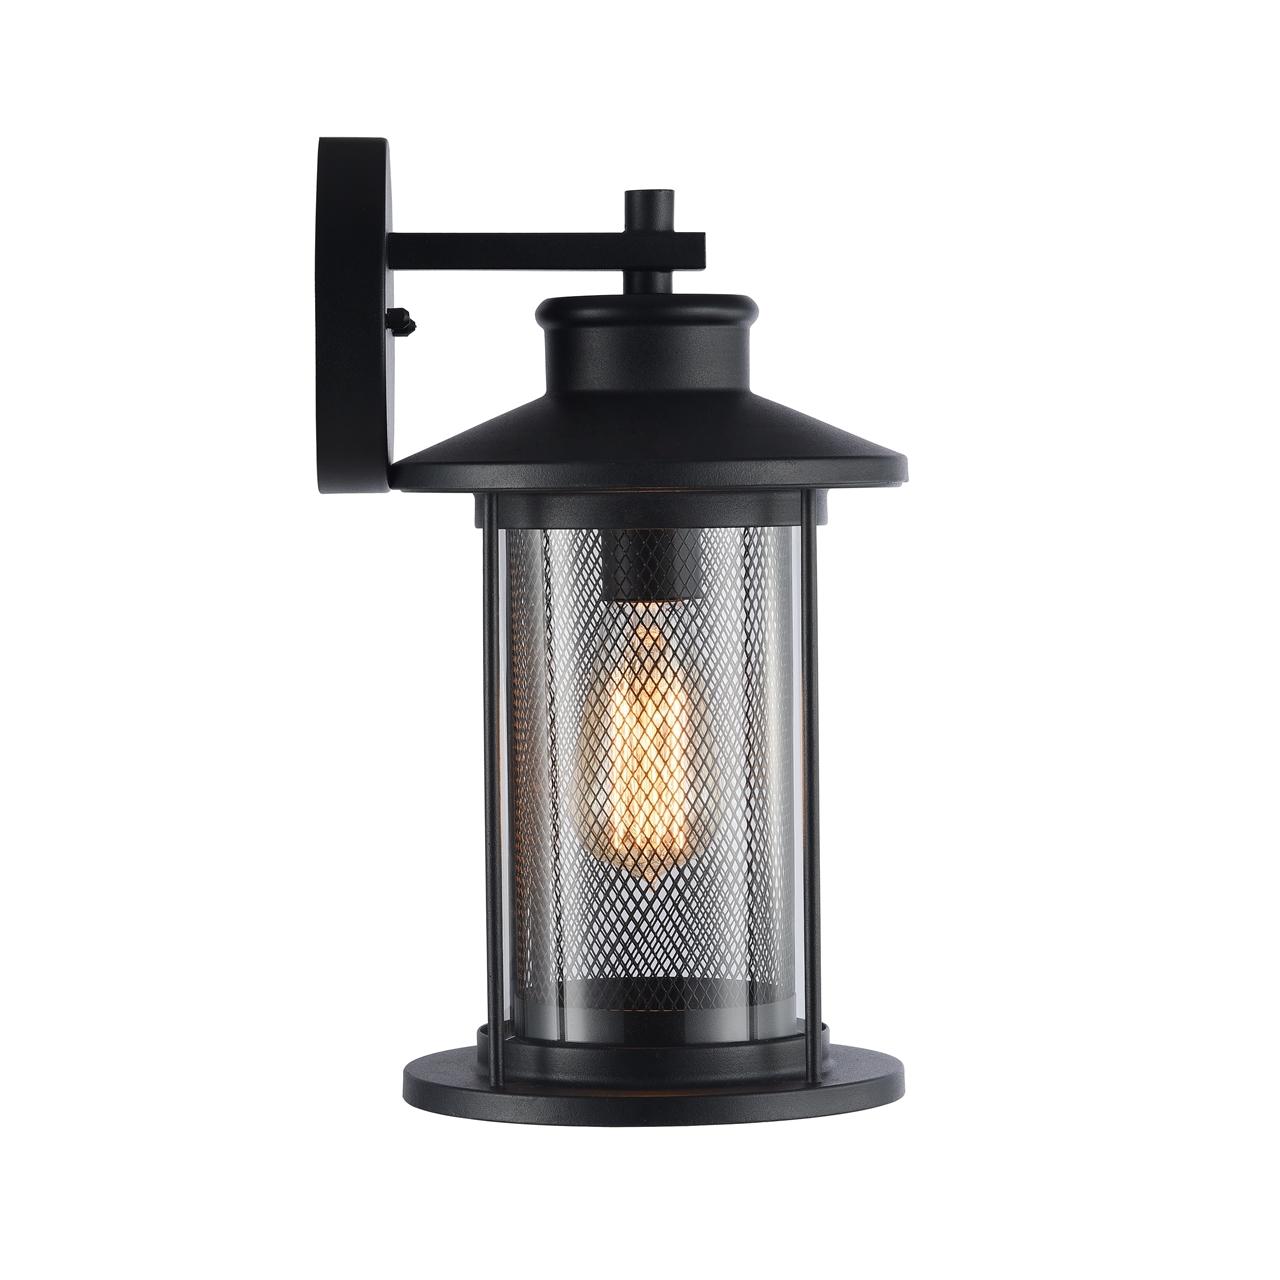 CHLOE Lighting, Inc CHLOE Lighting CRICHTON Transitional ... on Outdoor Wall Sconce Lighting id=37151